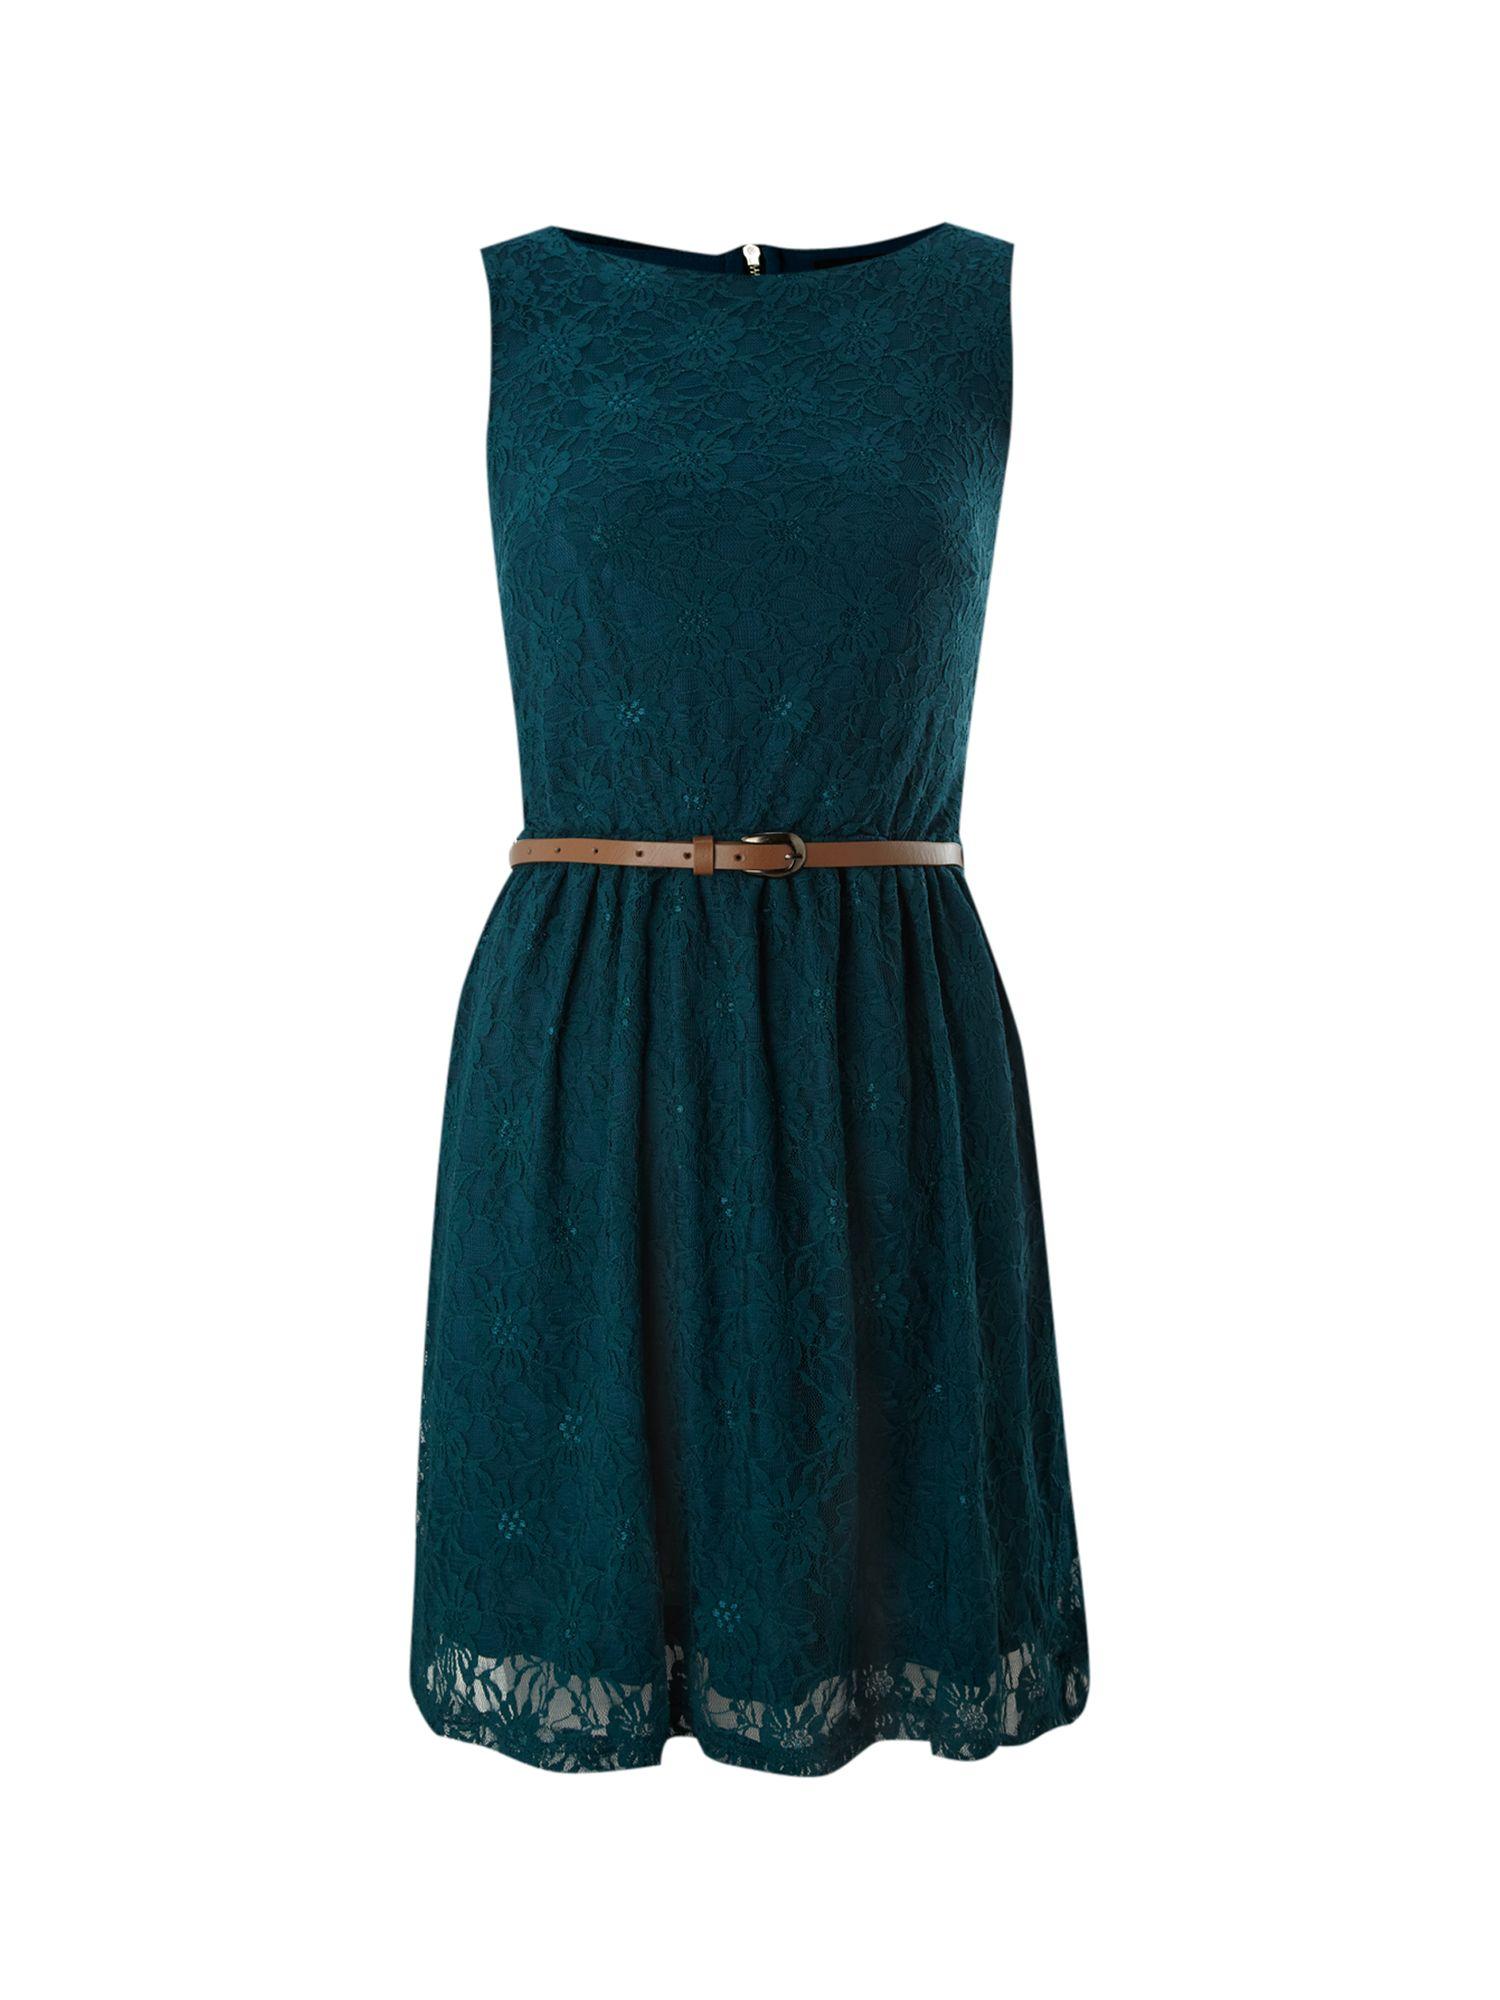 Herve Leger Dresses